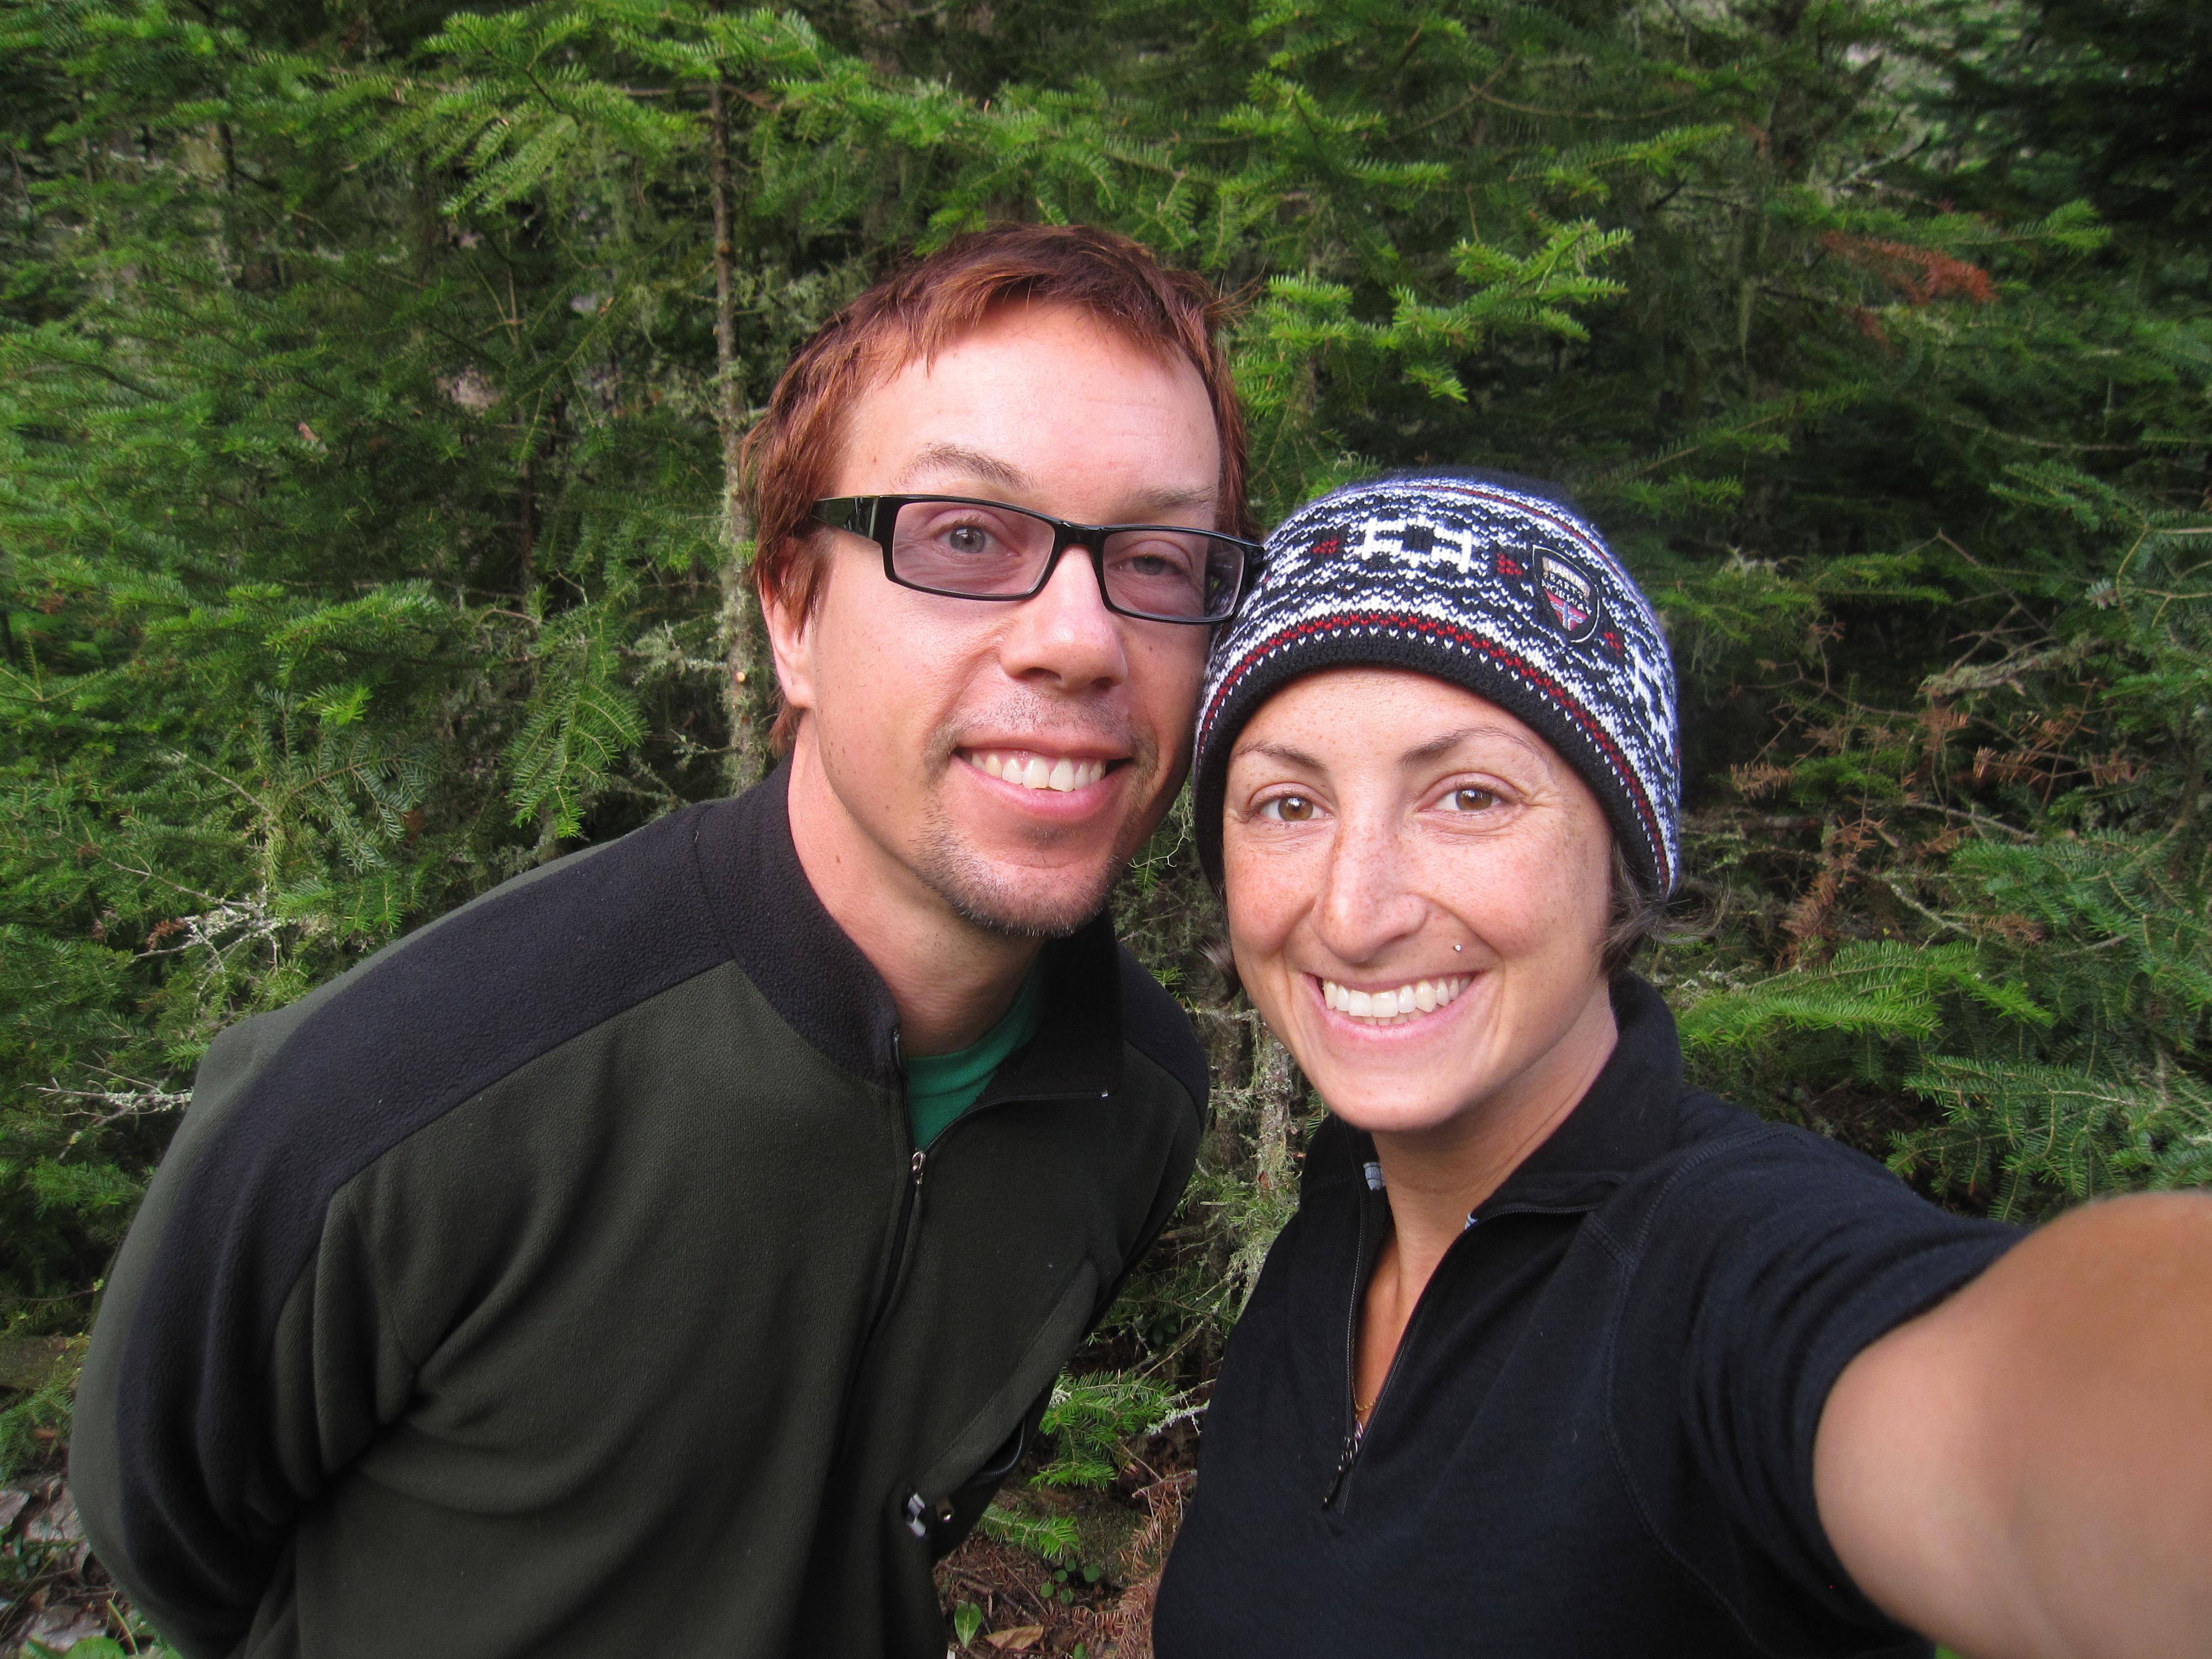 Shayna Norwood and her husband on their honeymoon.